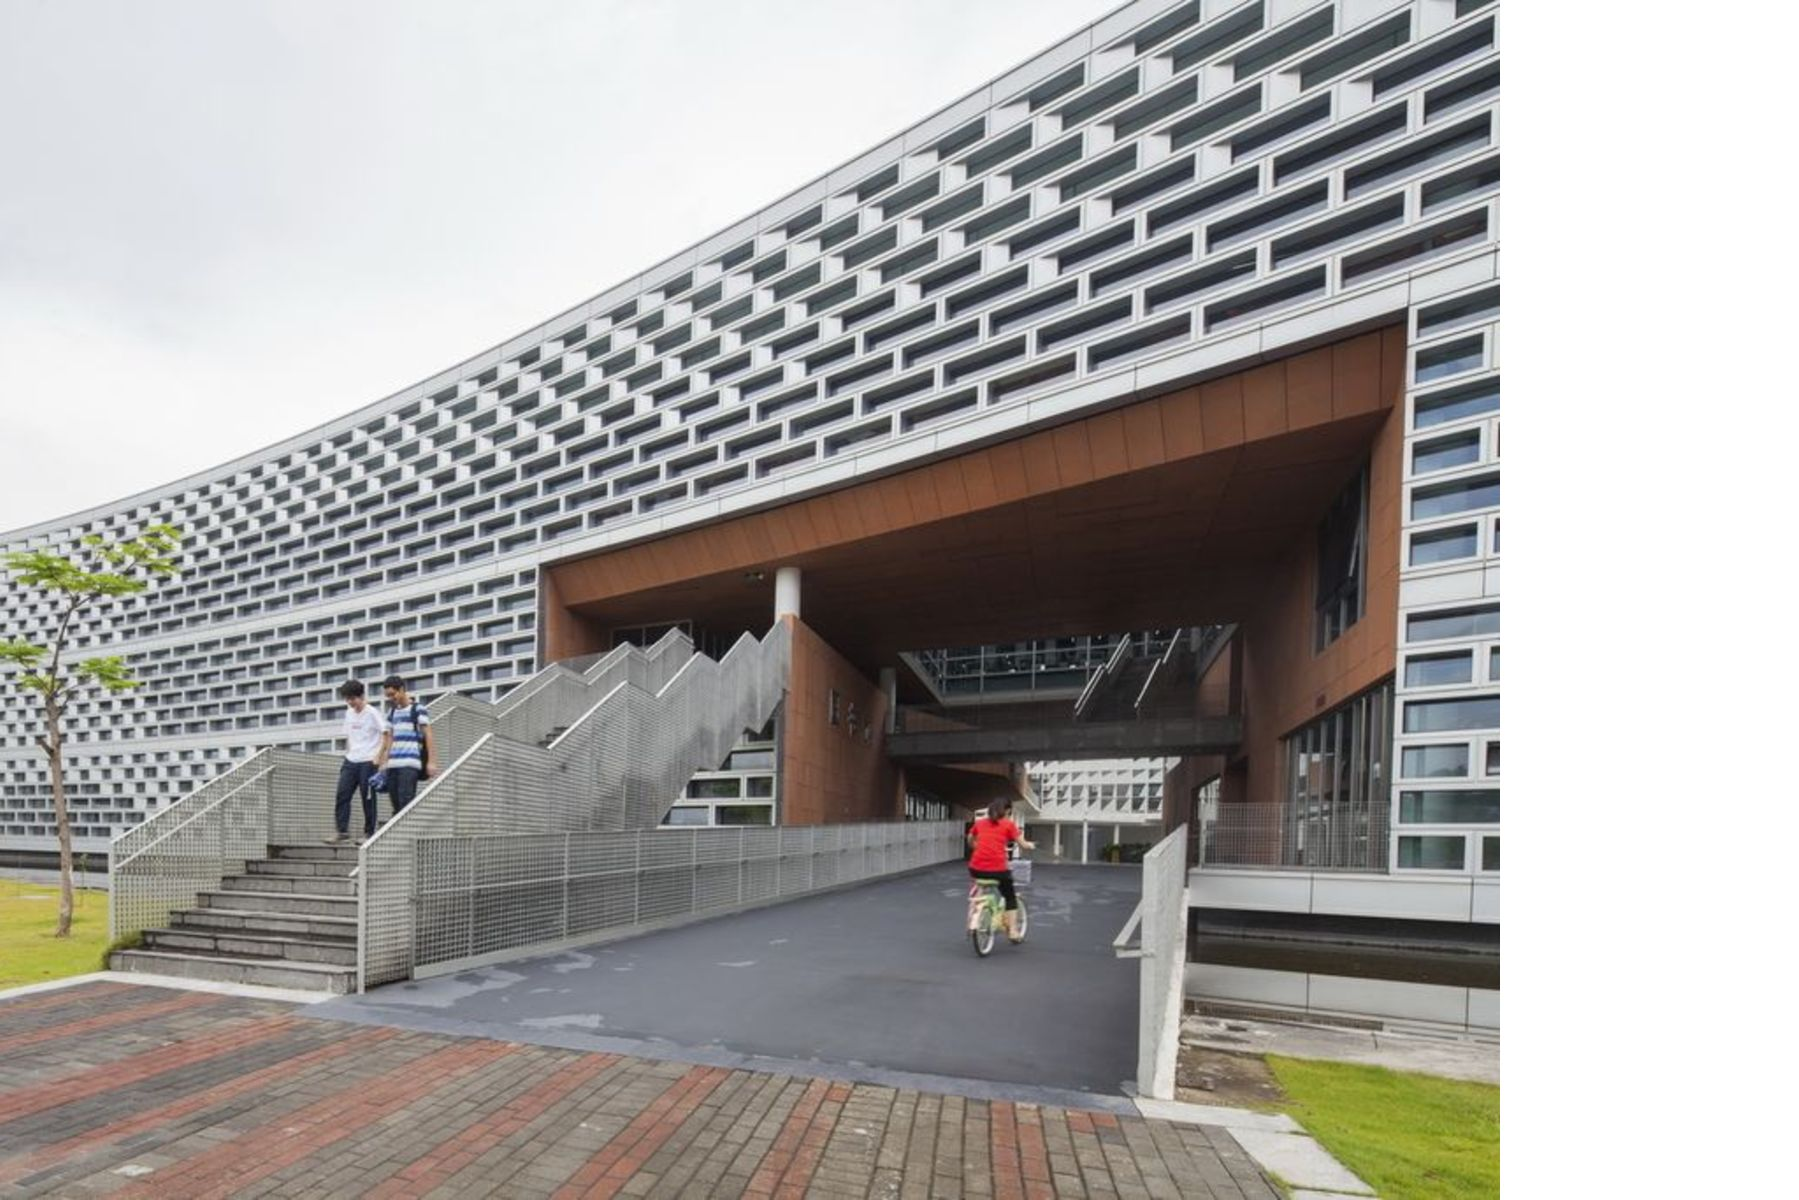 Urbanus and SUST university library in Shenzhen